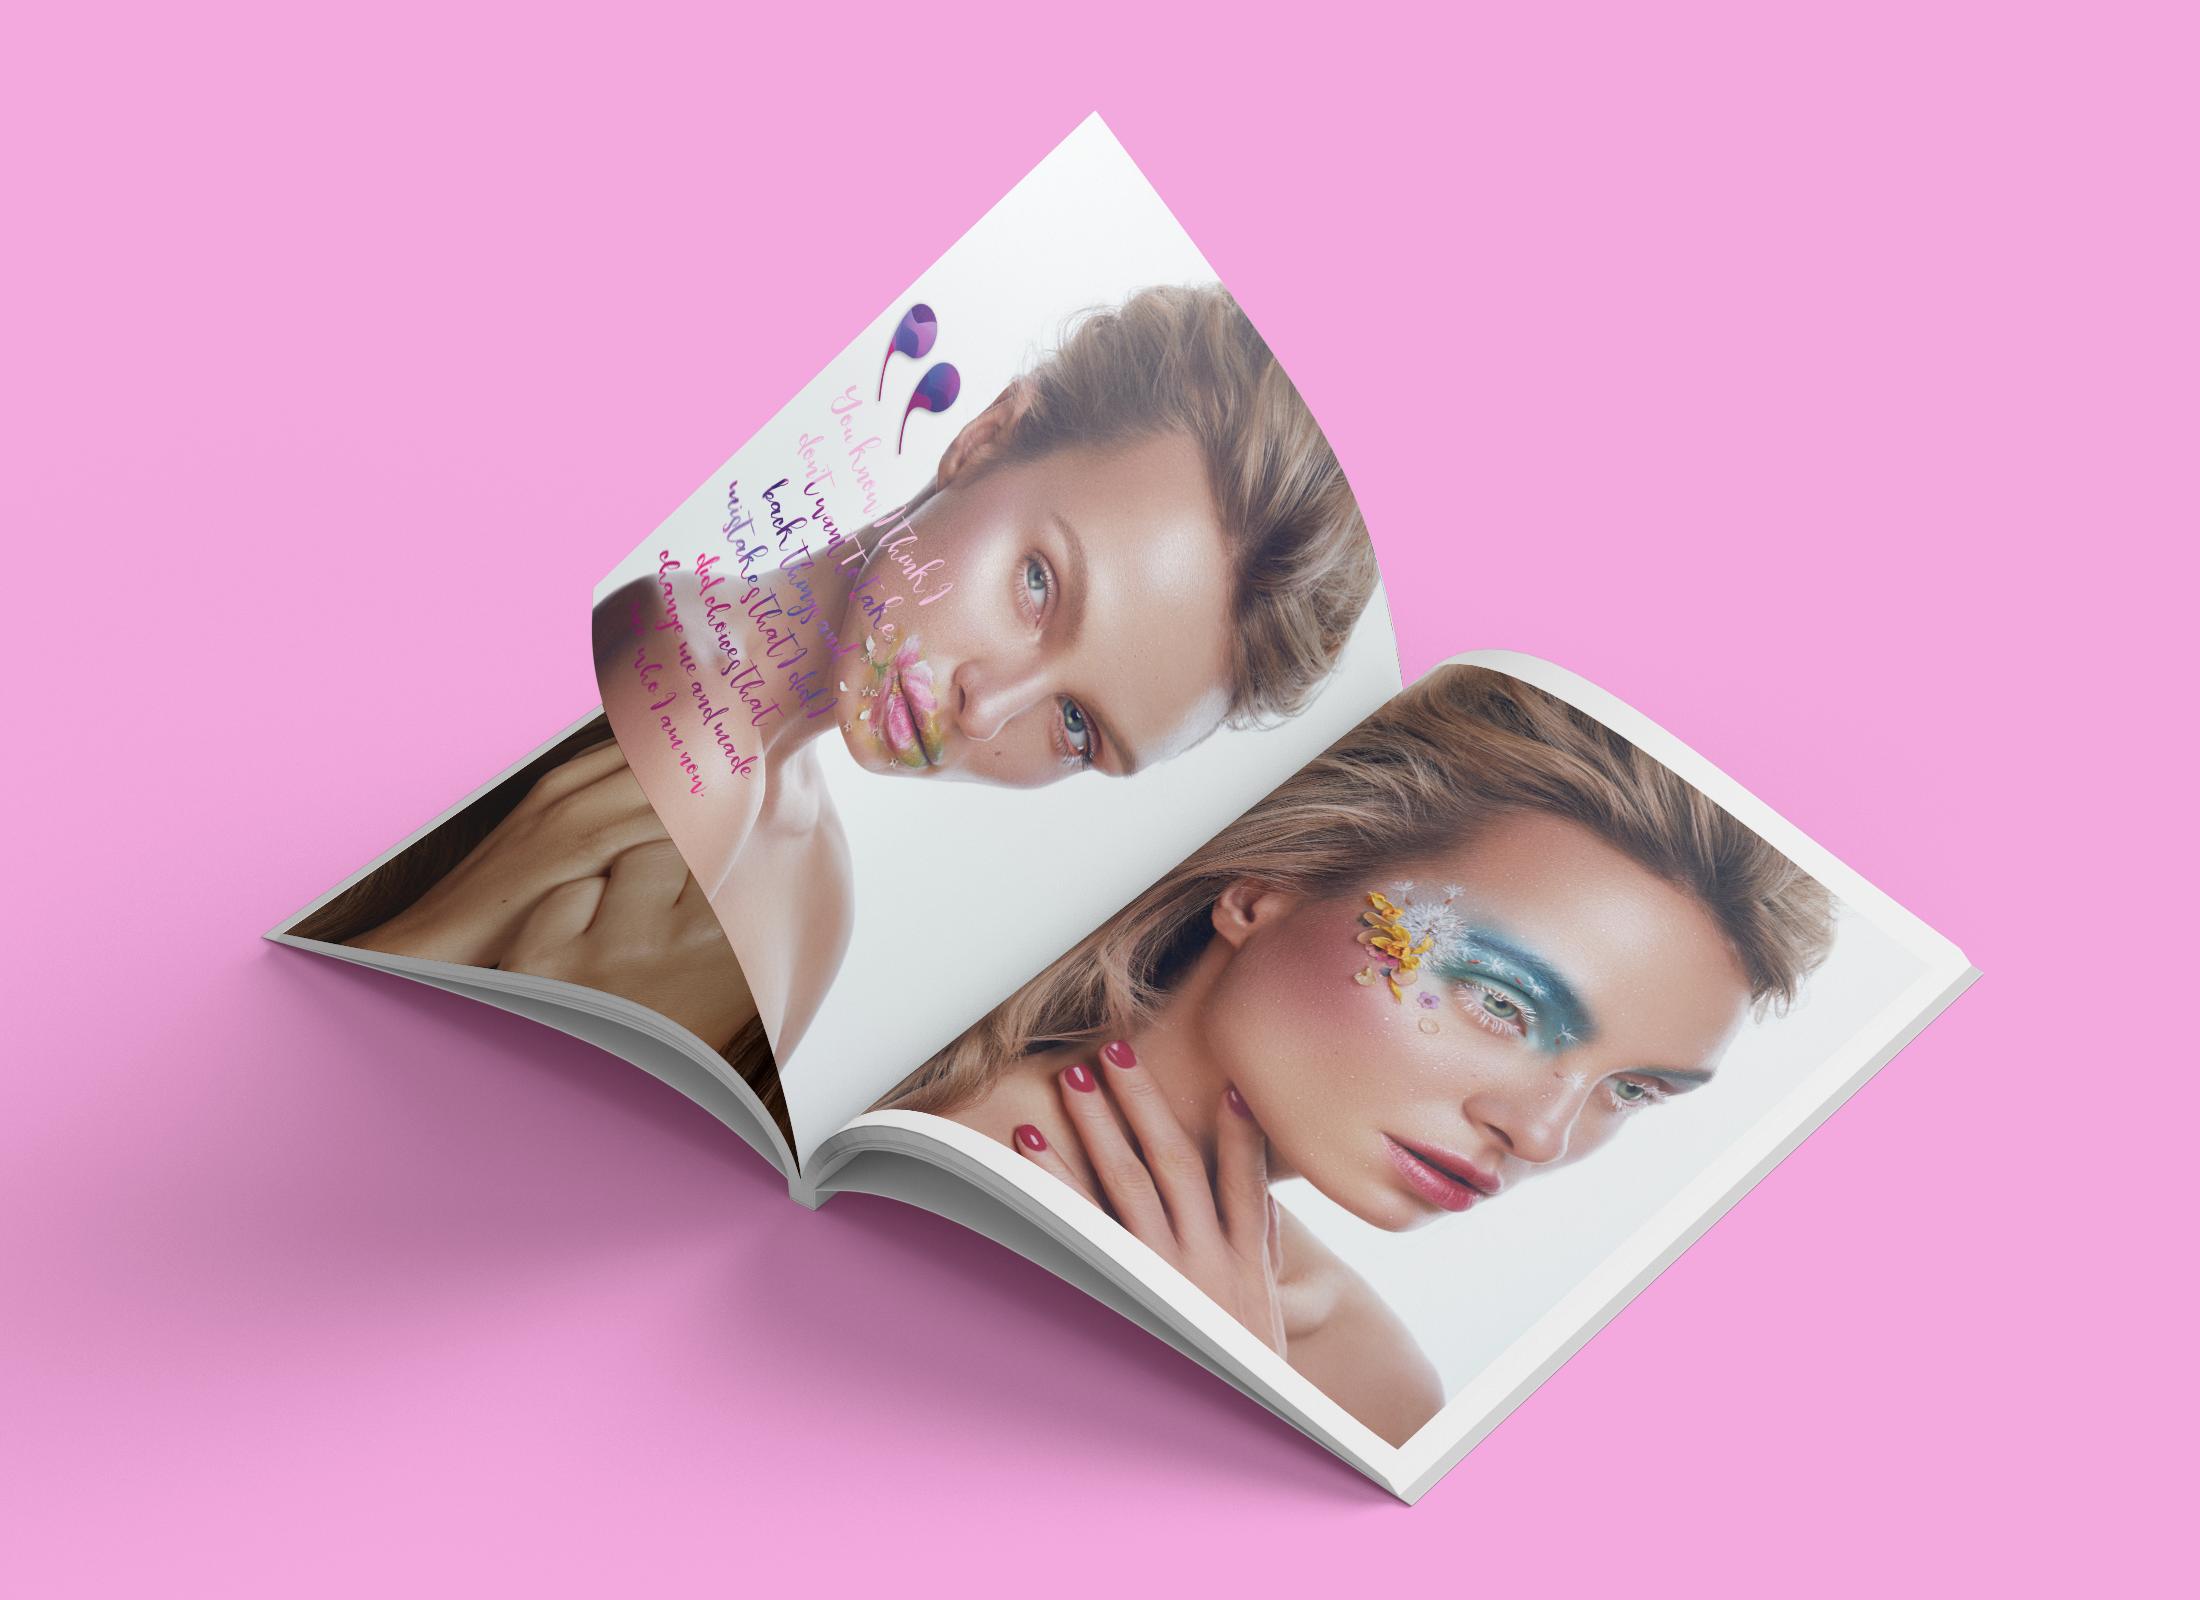 Model Citizen Magazine Issue 38, Macky Suson, Fashion Inclusion Now5.png